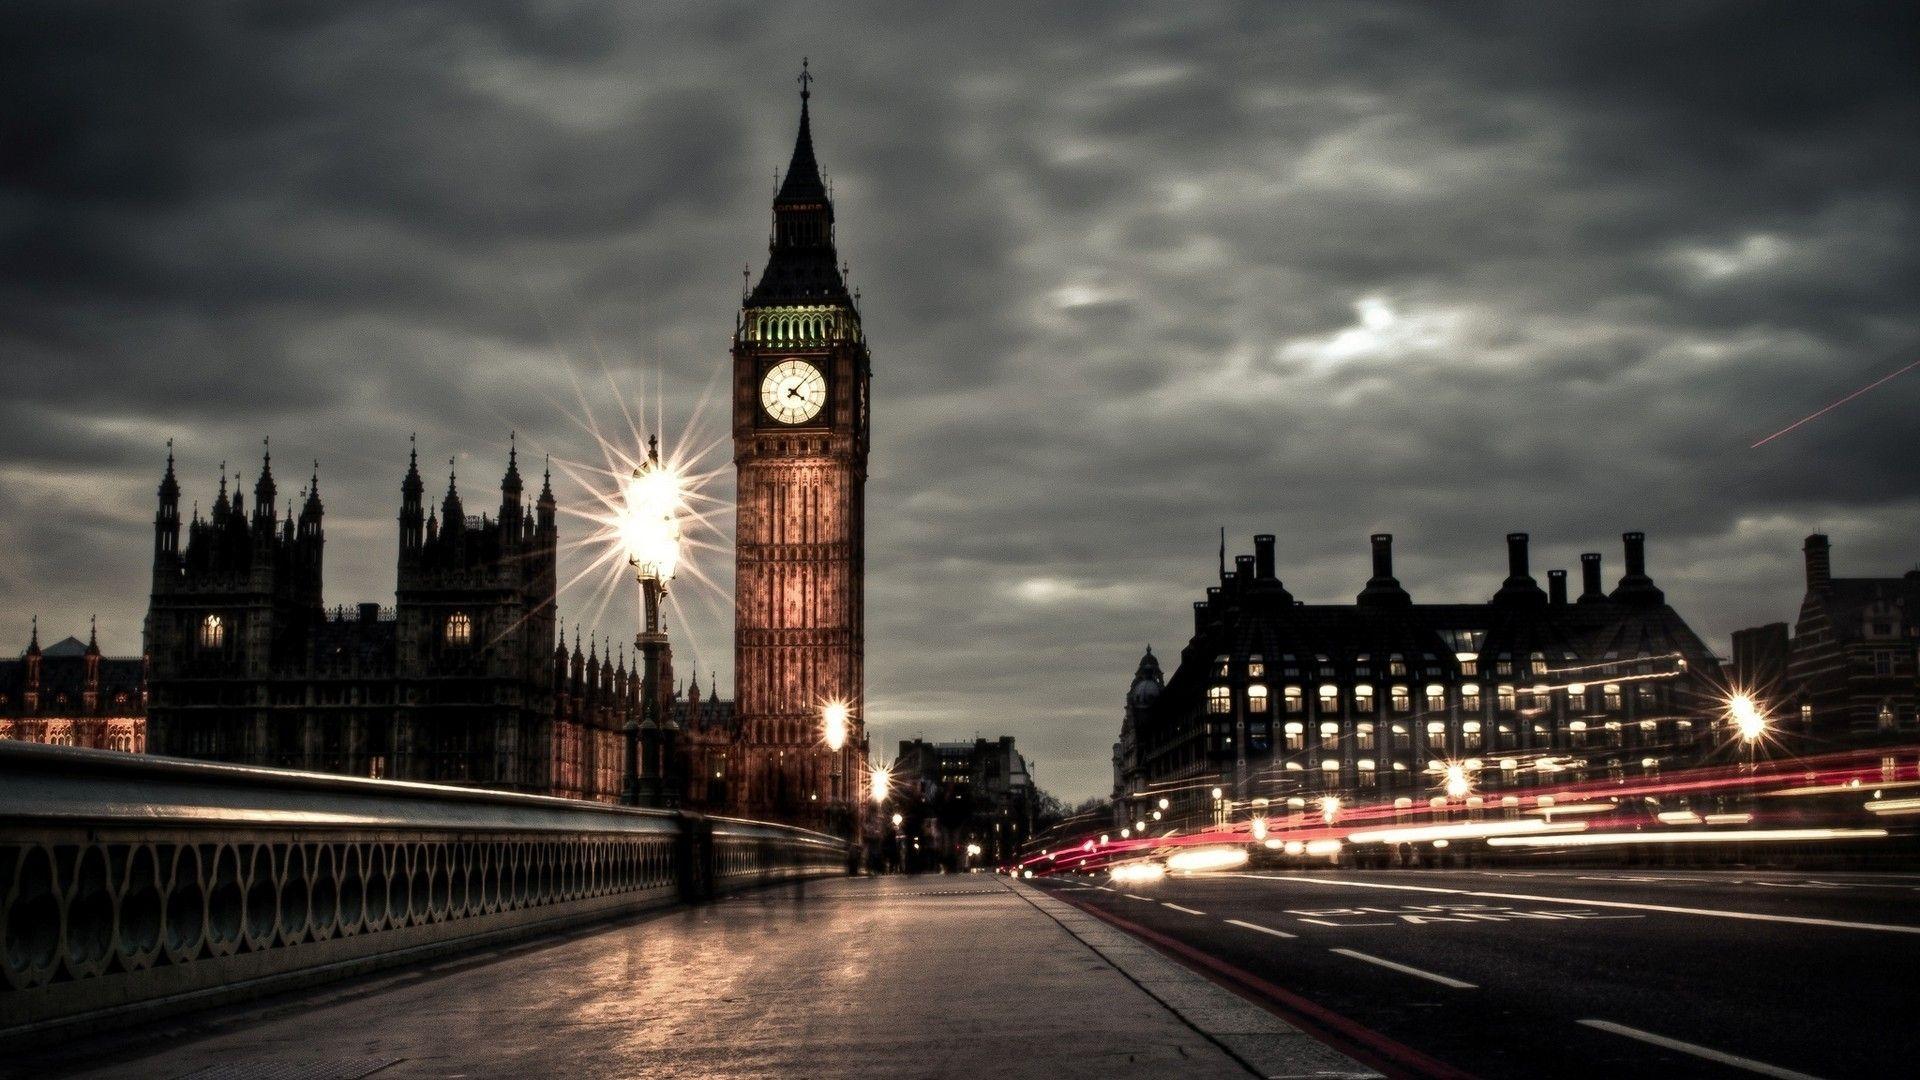 Cityscape London Pictures